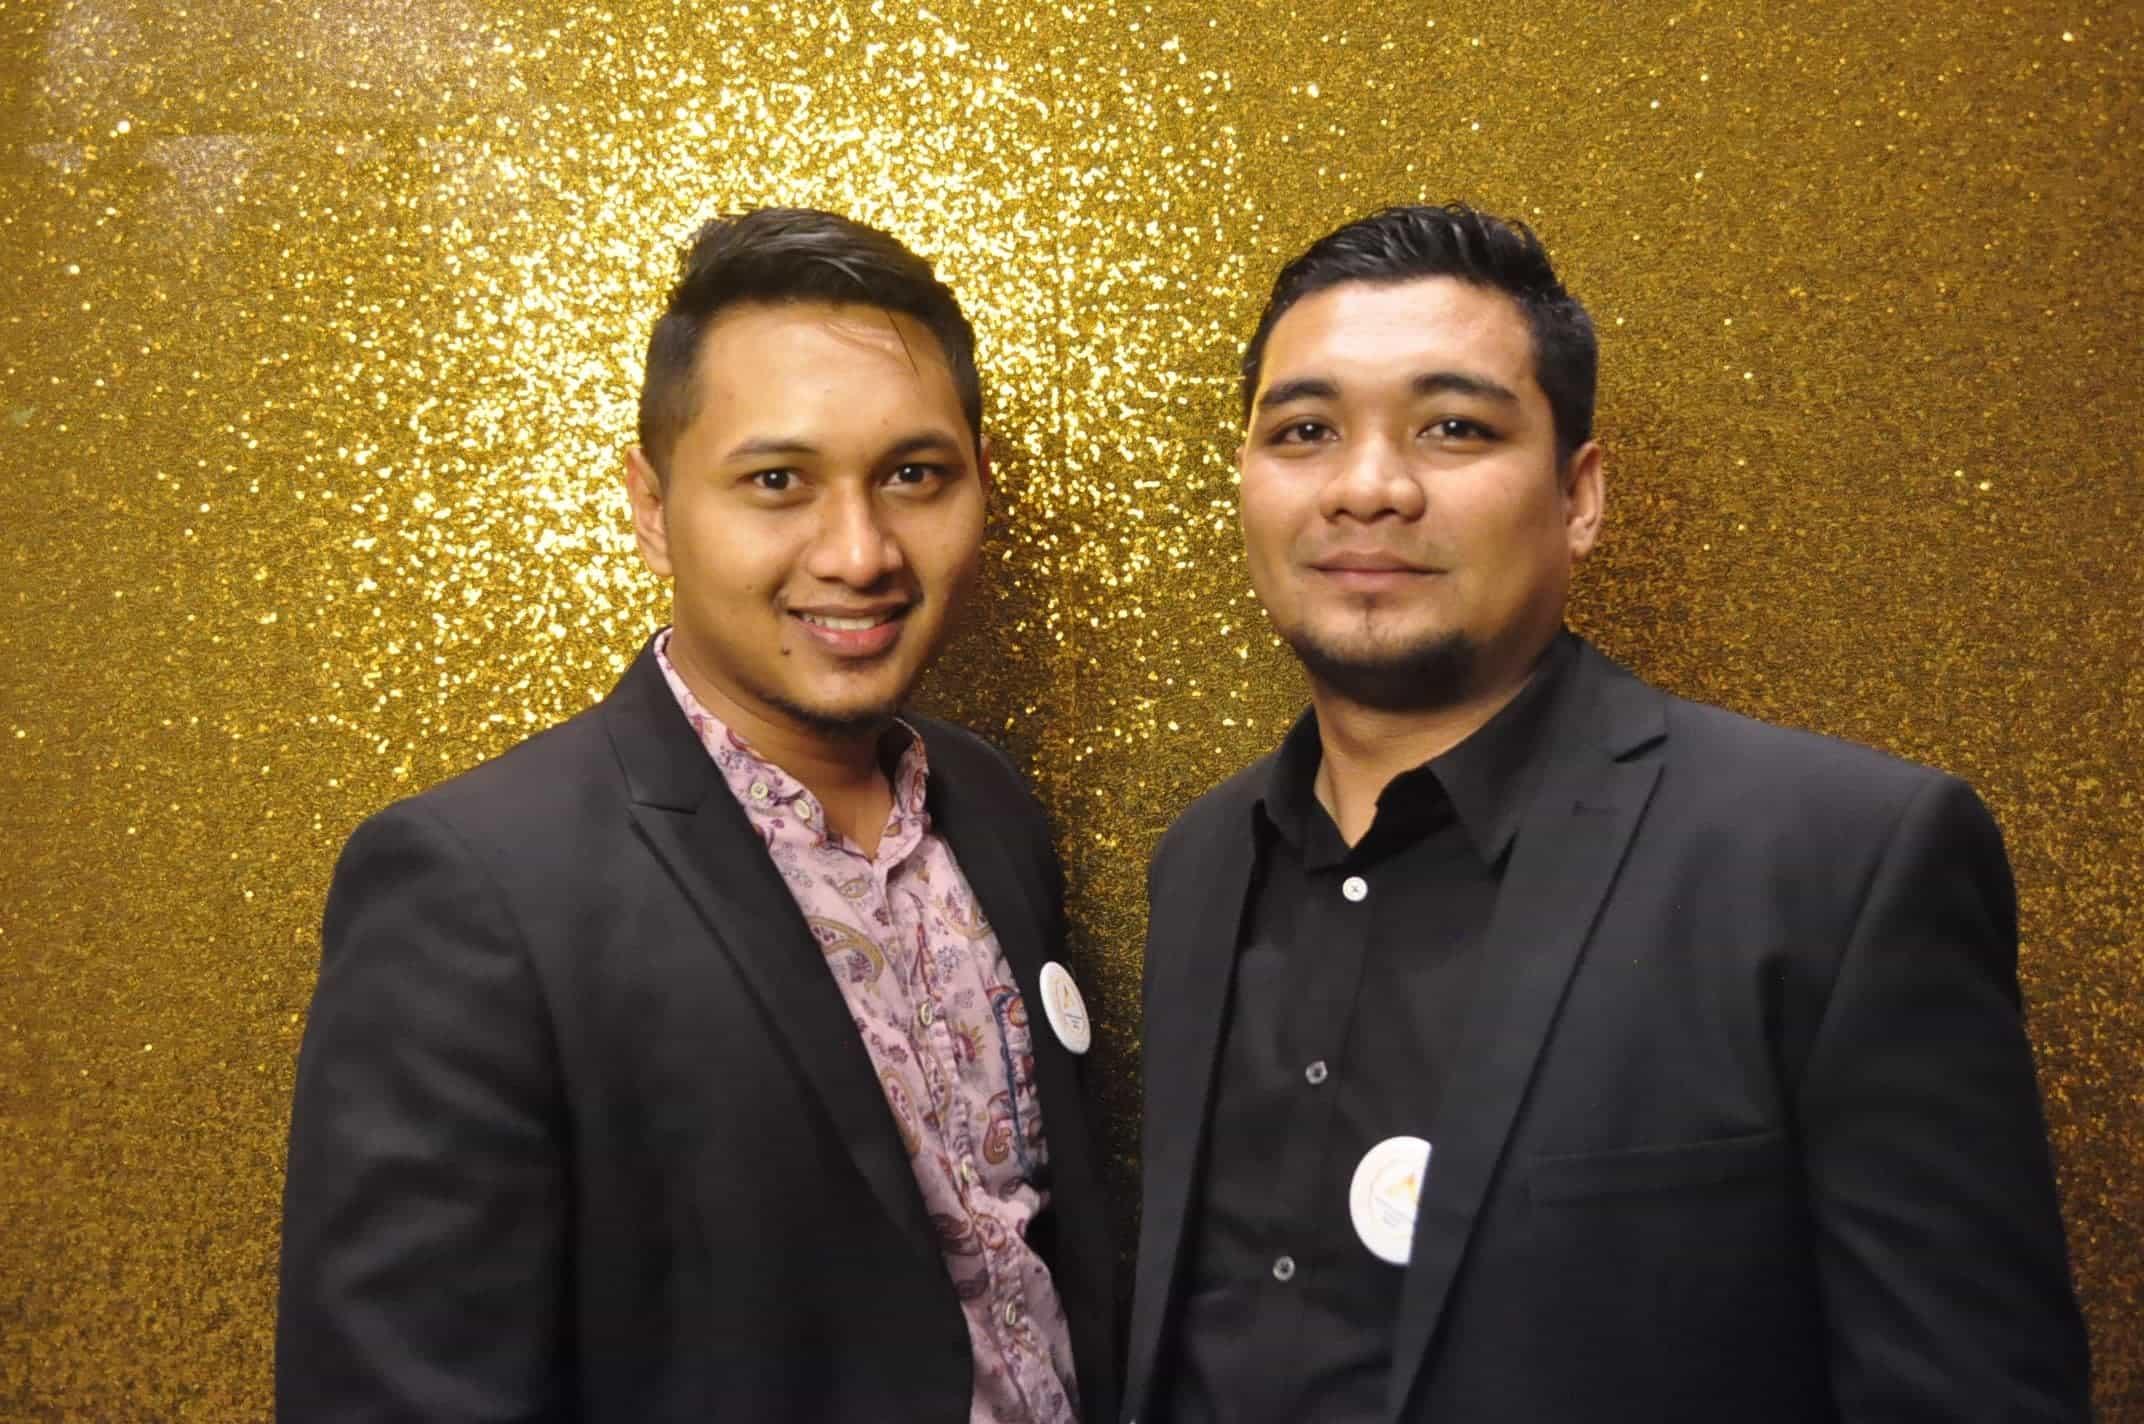 Malam Gala Anggun 2018 (Photobooth) 4